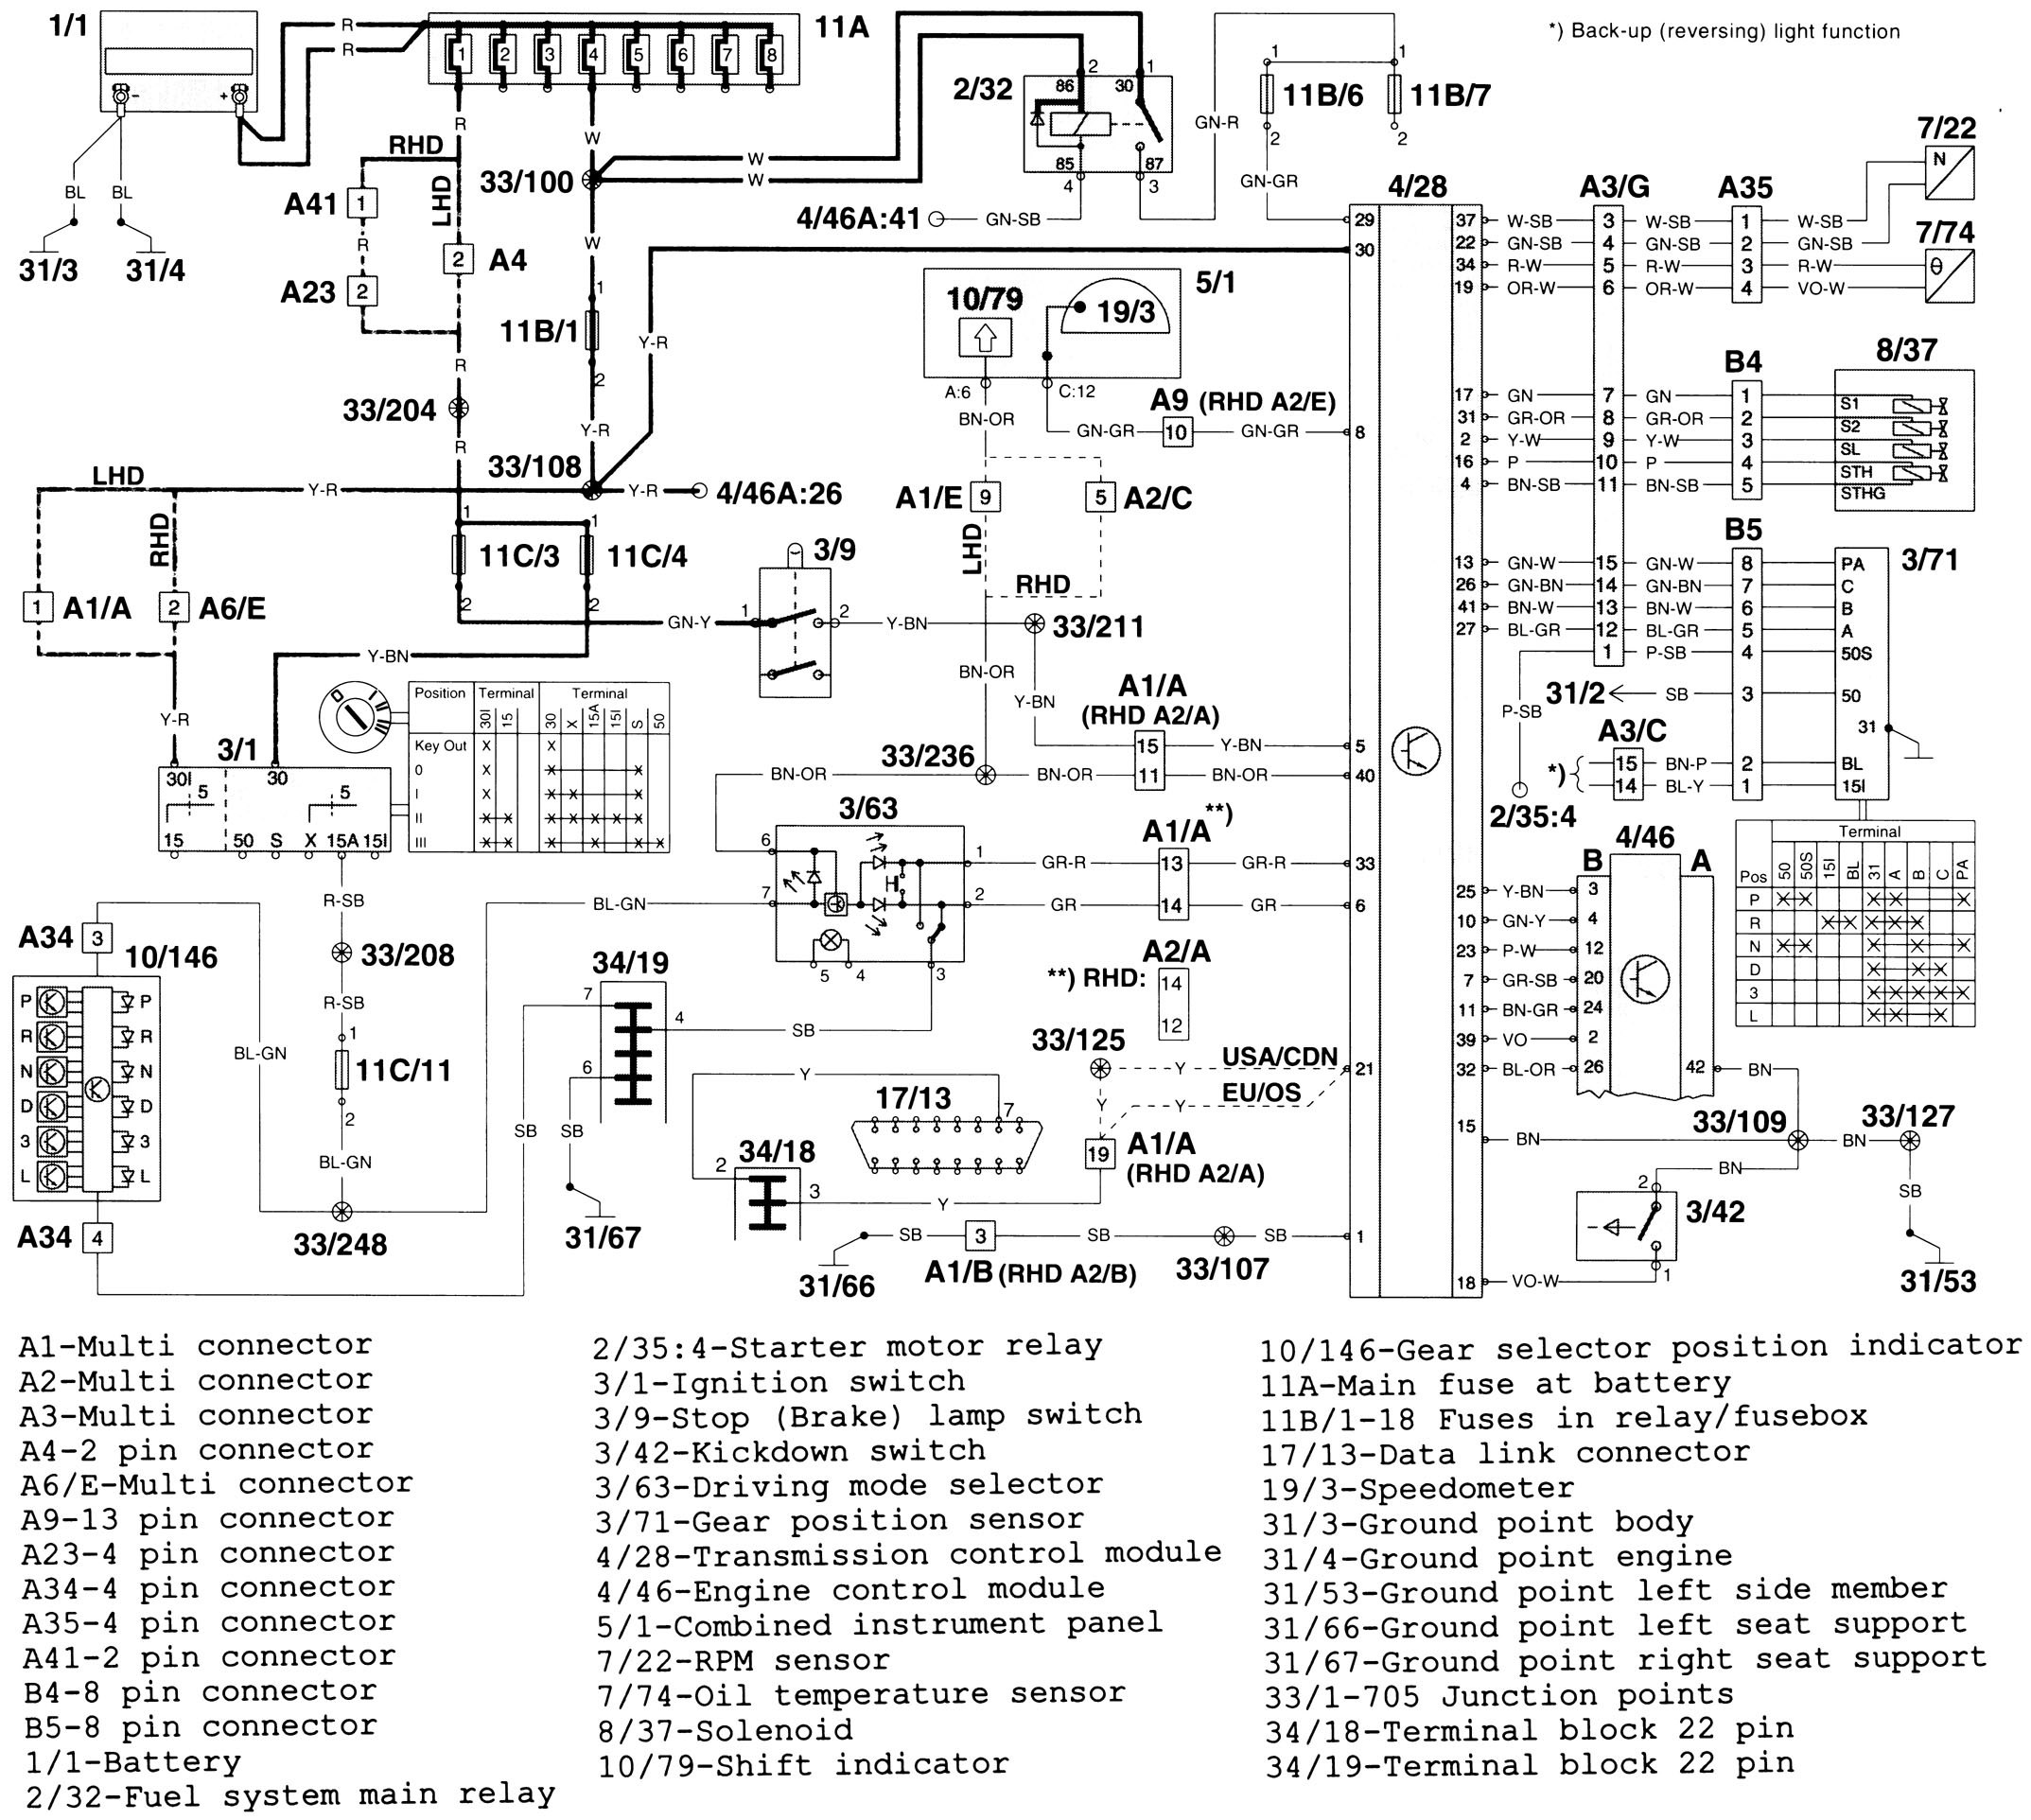 Volvo Edc4 Wiring Diagram